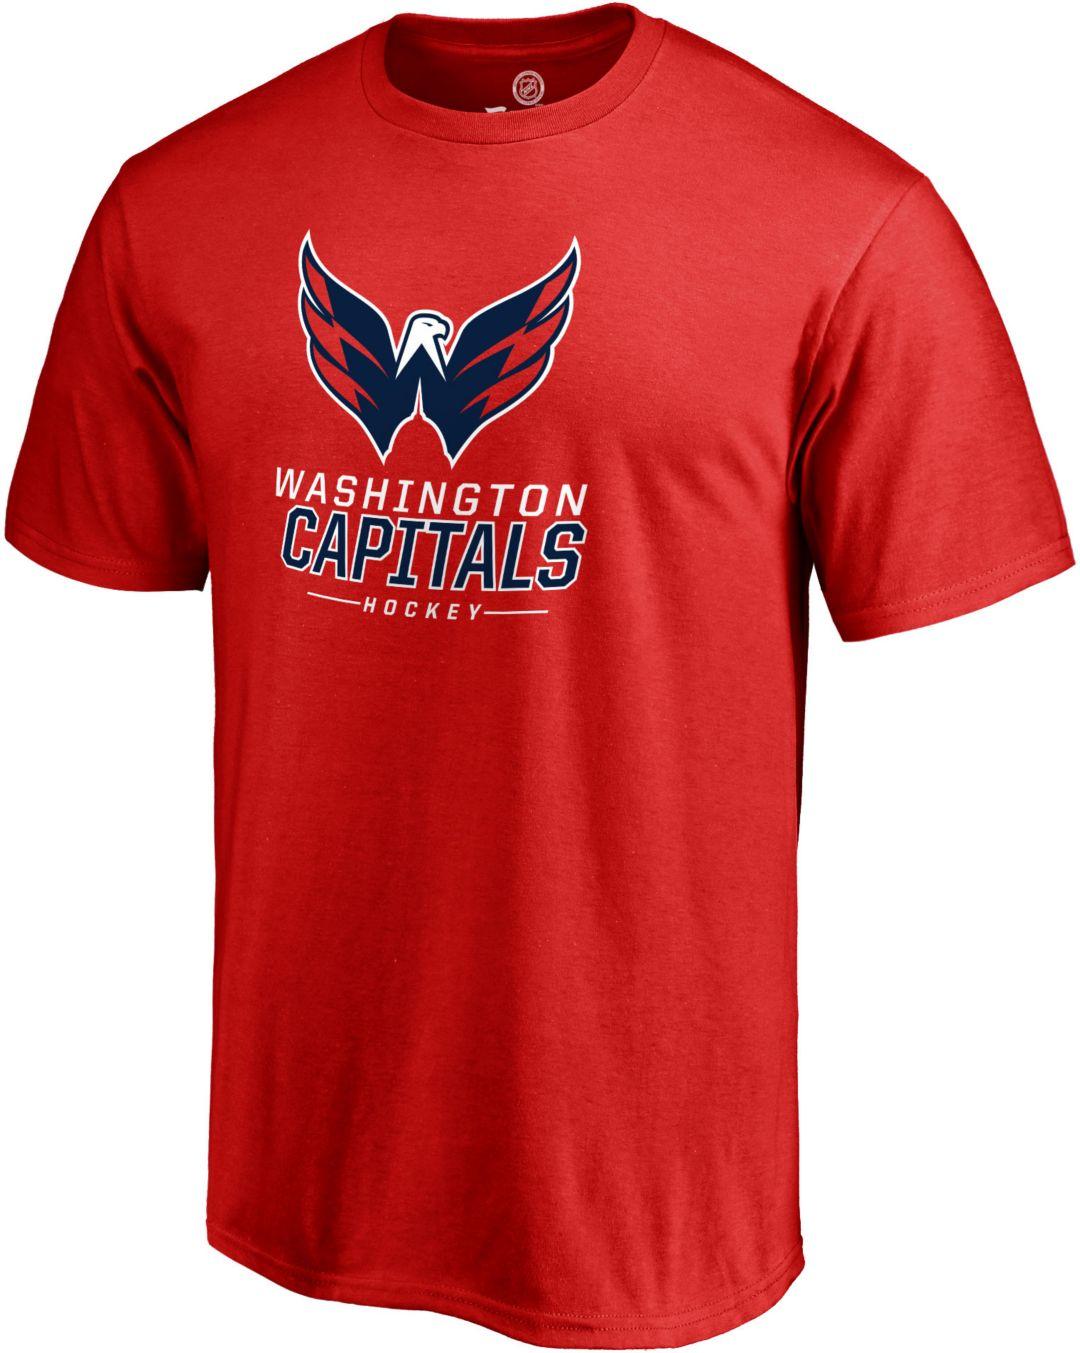 wholesale dealer 28884 d79bf NHL Men's Washington Capitals Lockup Red T-Shirt